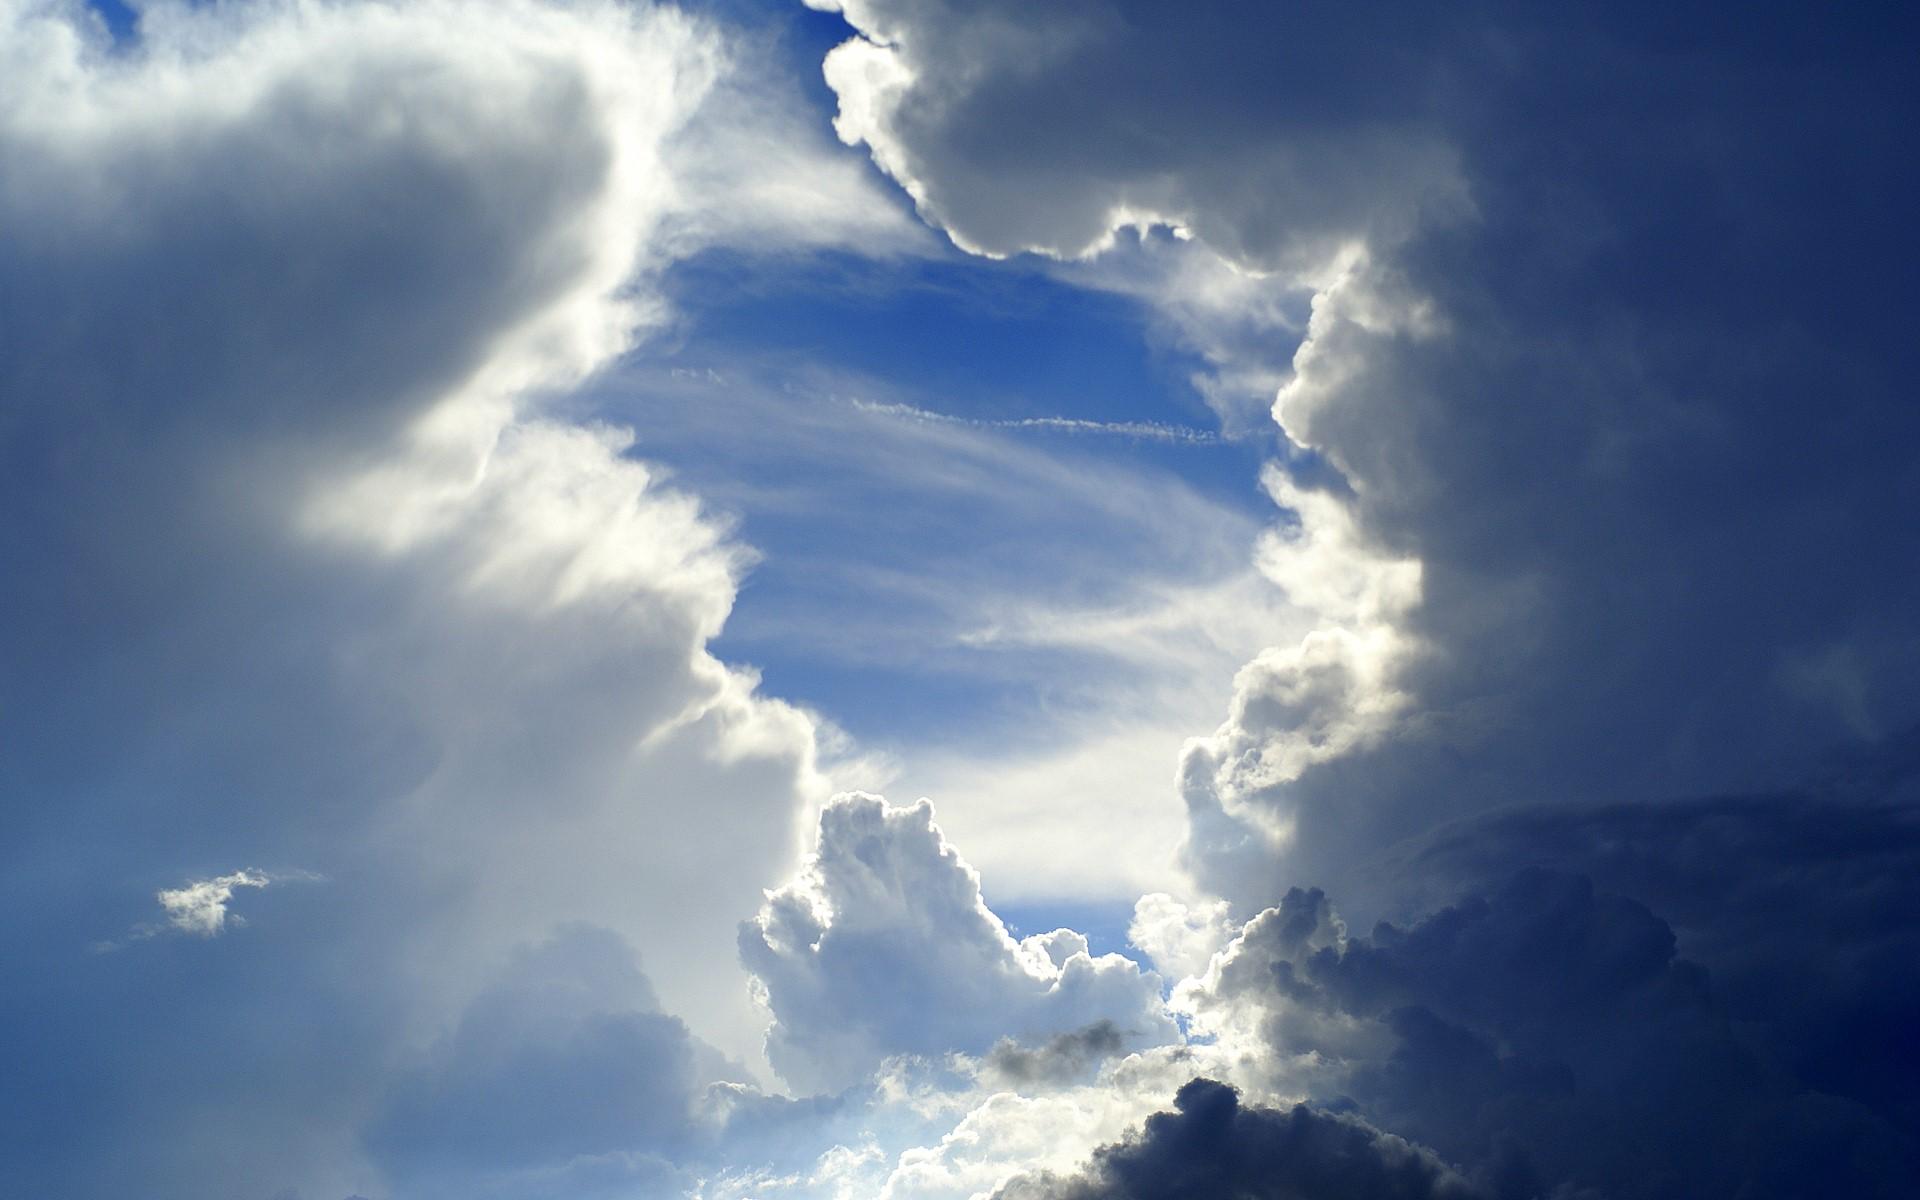 http://thebarefootrunners.org/sites/default/files/sky.jpg